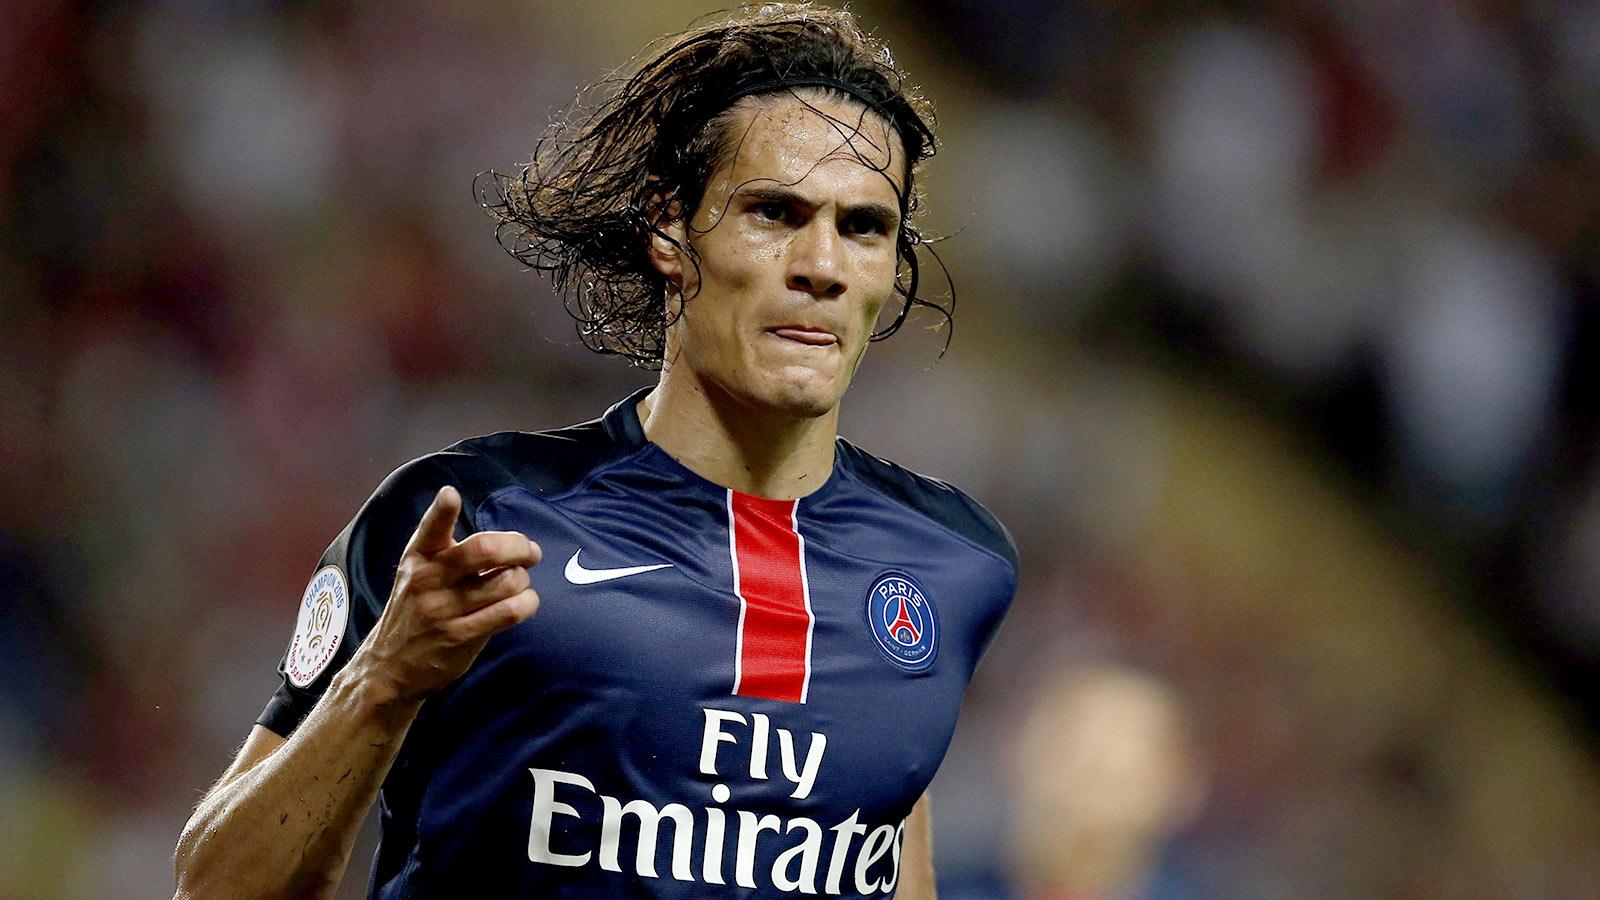 Paris Saint-Germain beat Monaco with brace from Edinson Cavani